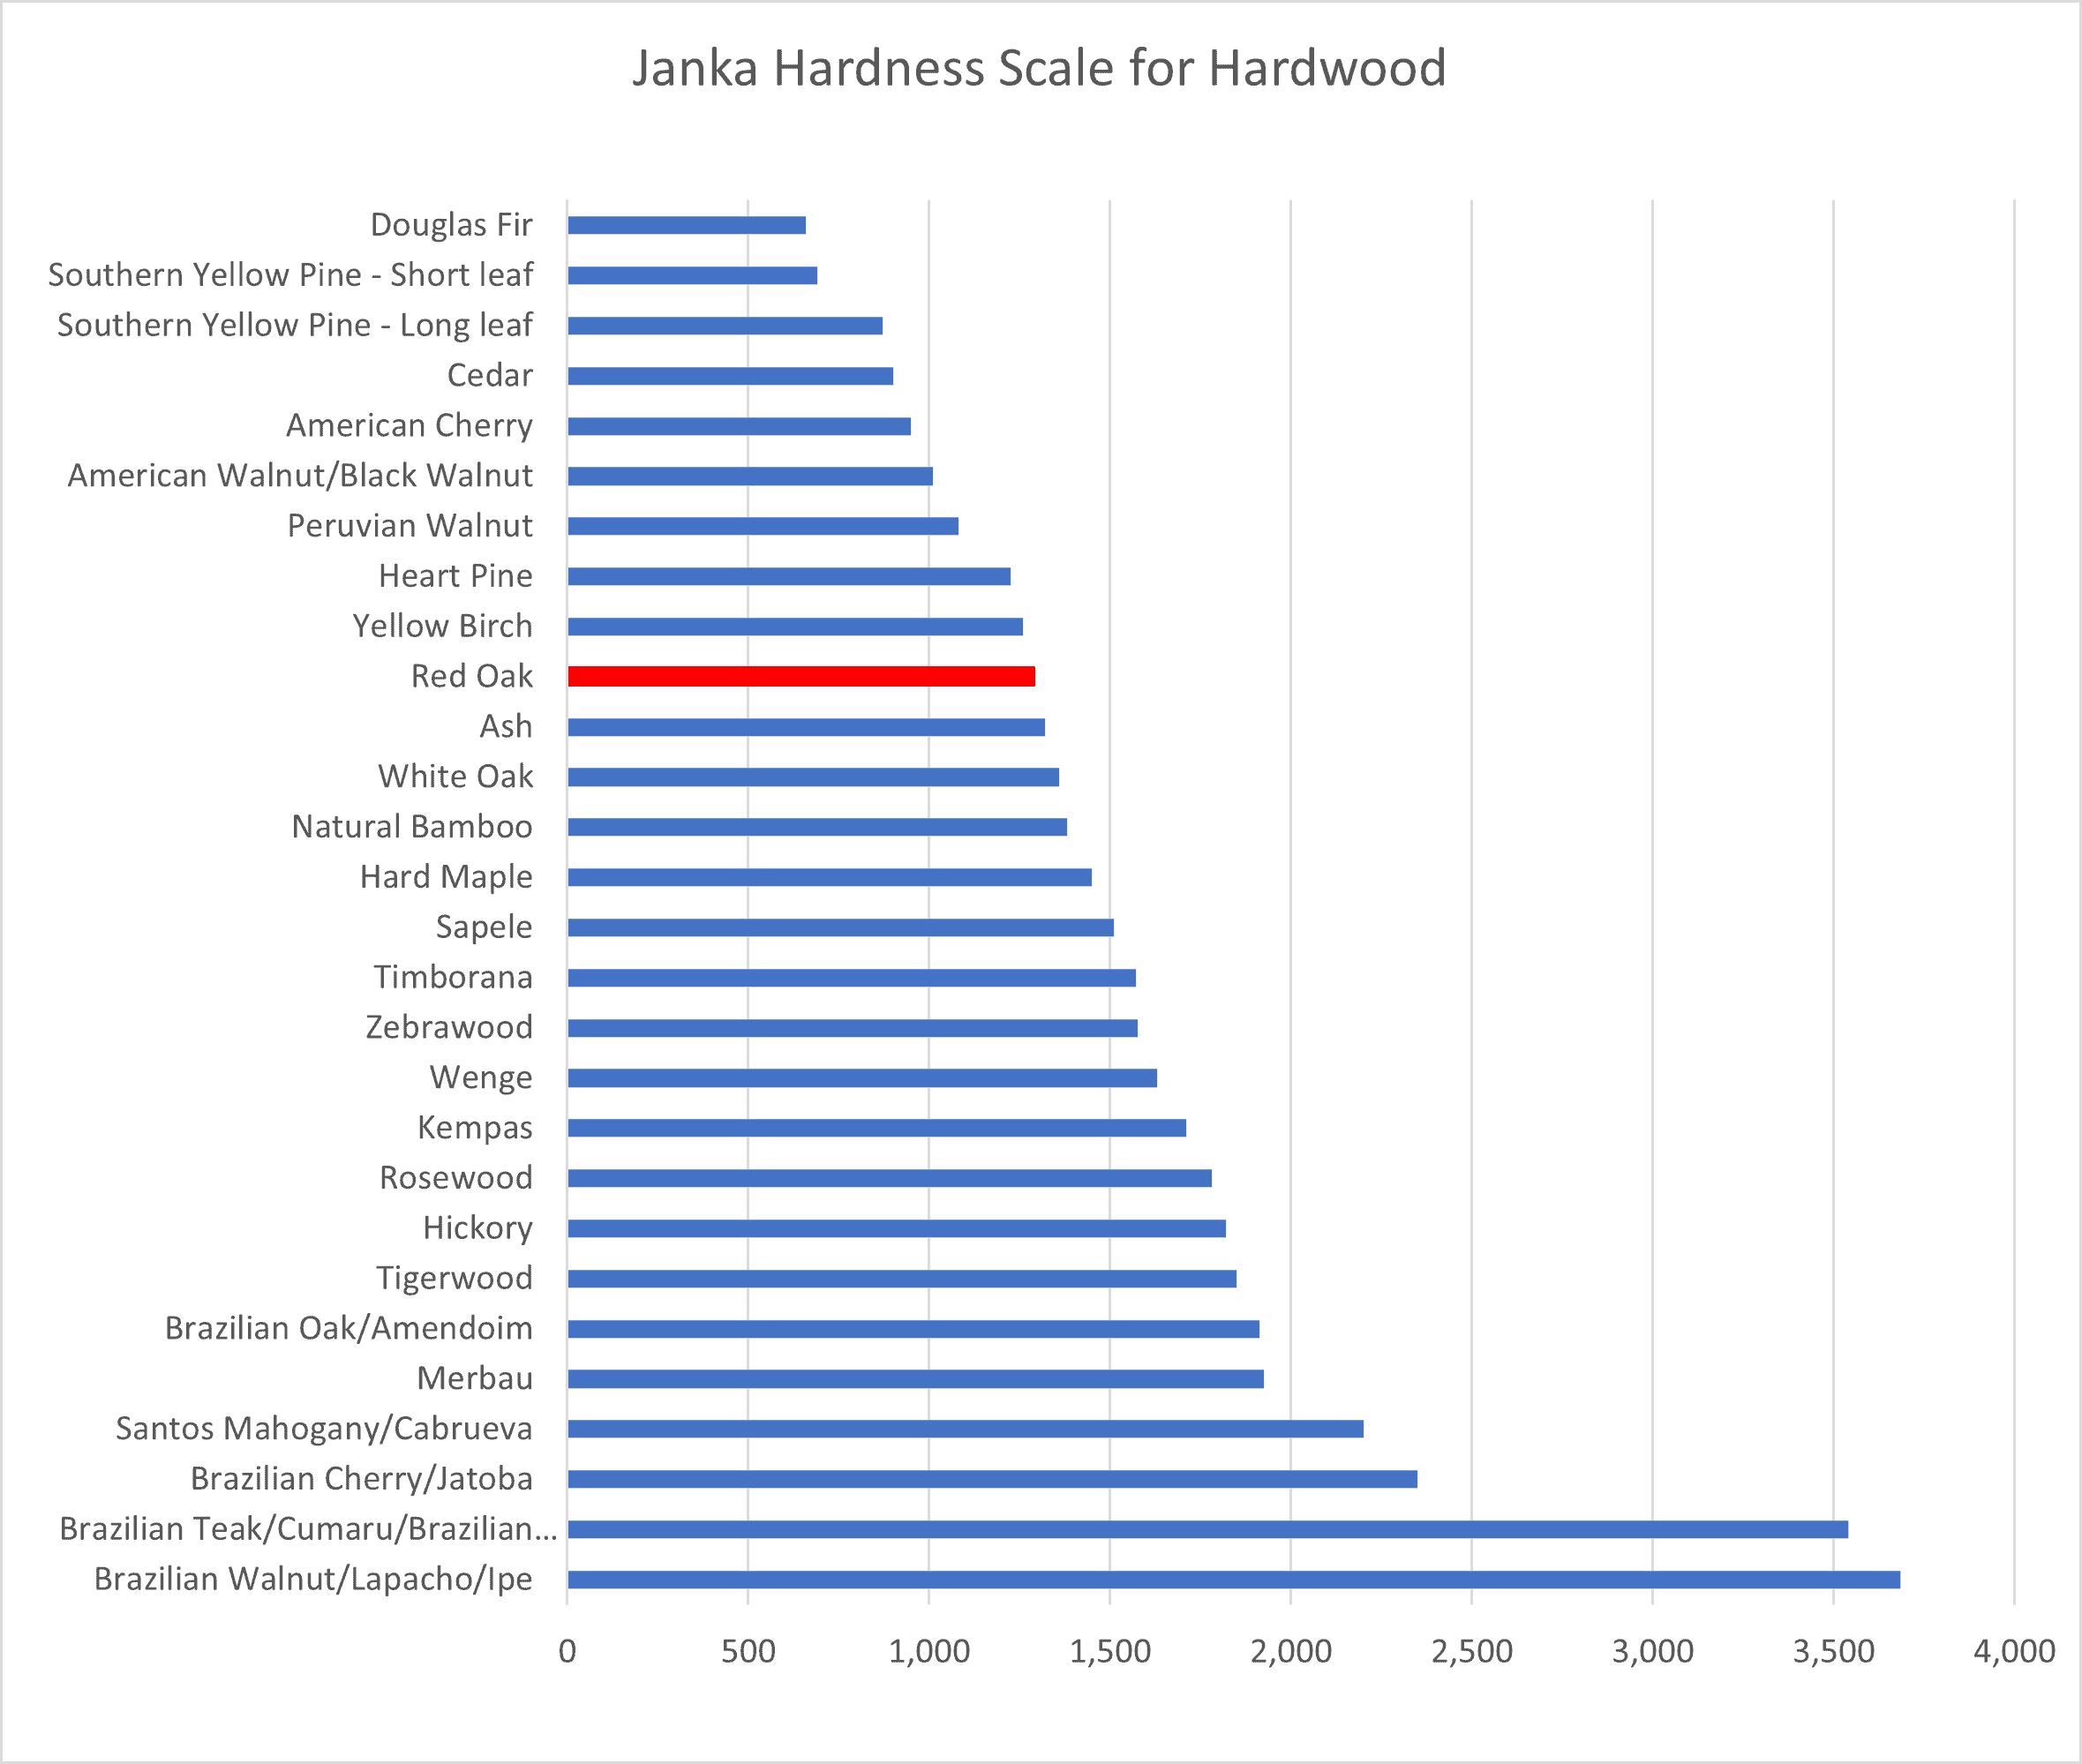 How Hard Is Hardwood The Janka Scale